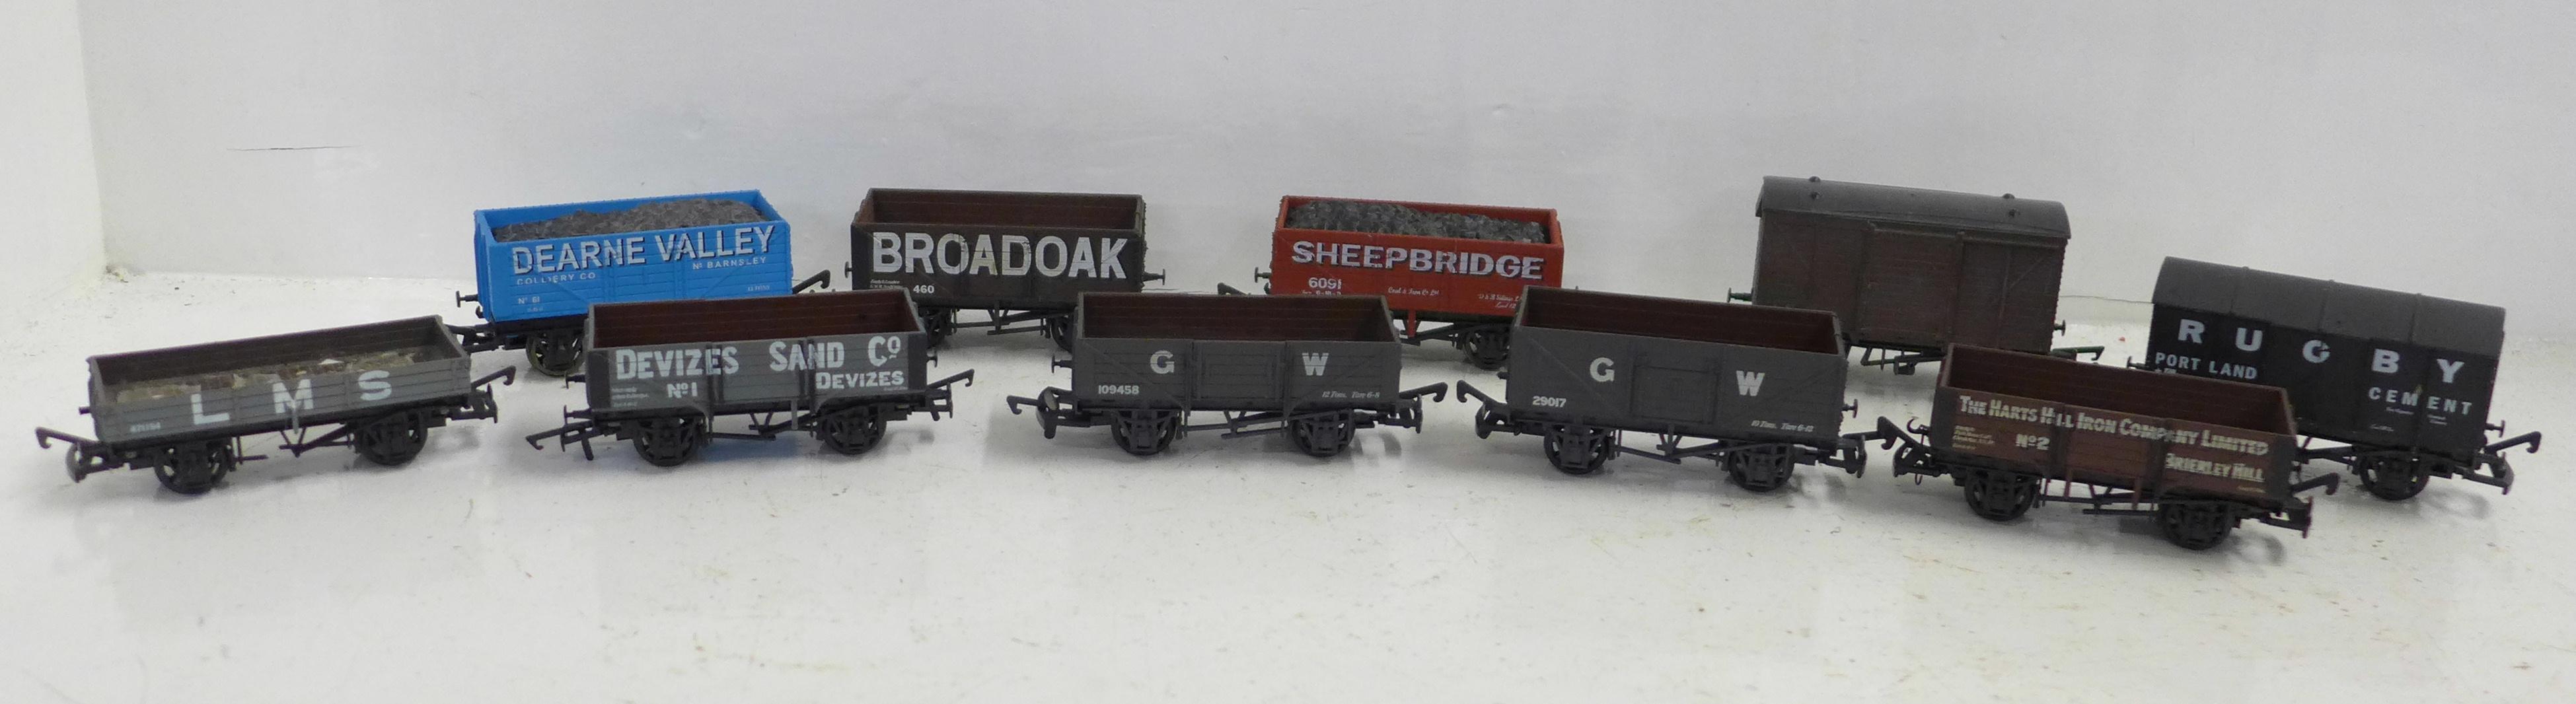 Ten OO gauge model railway wagons including Airfix and Dapol